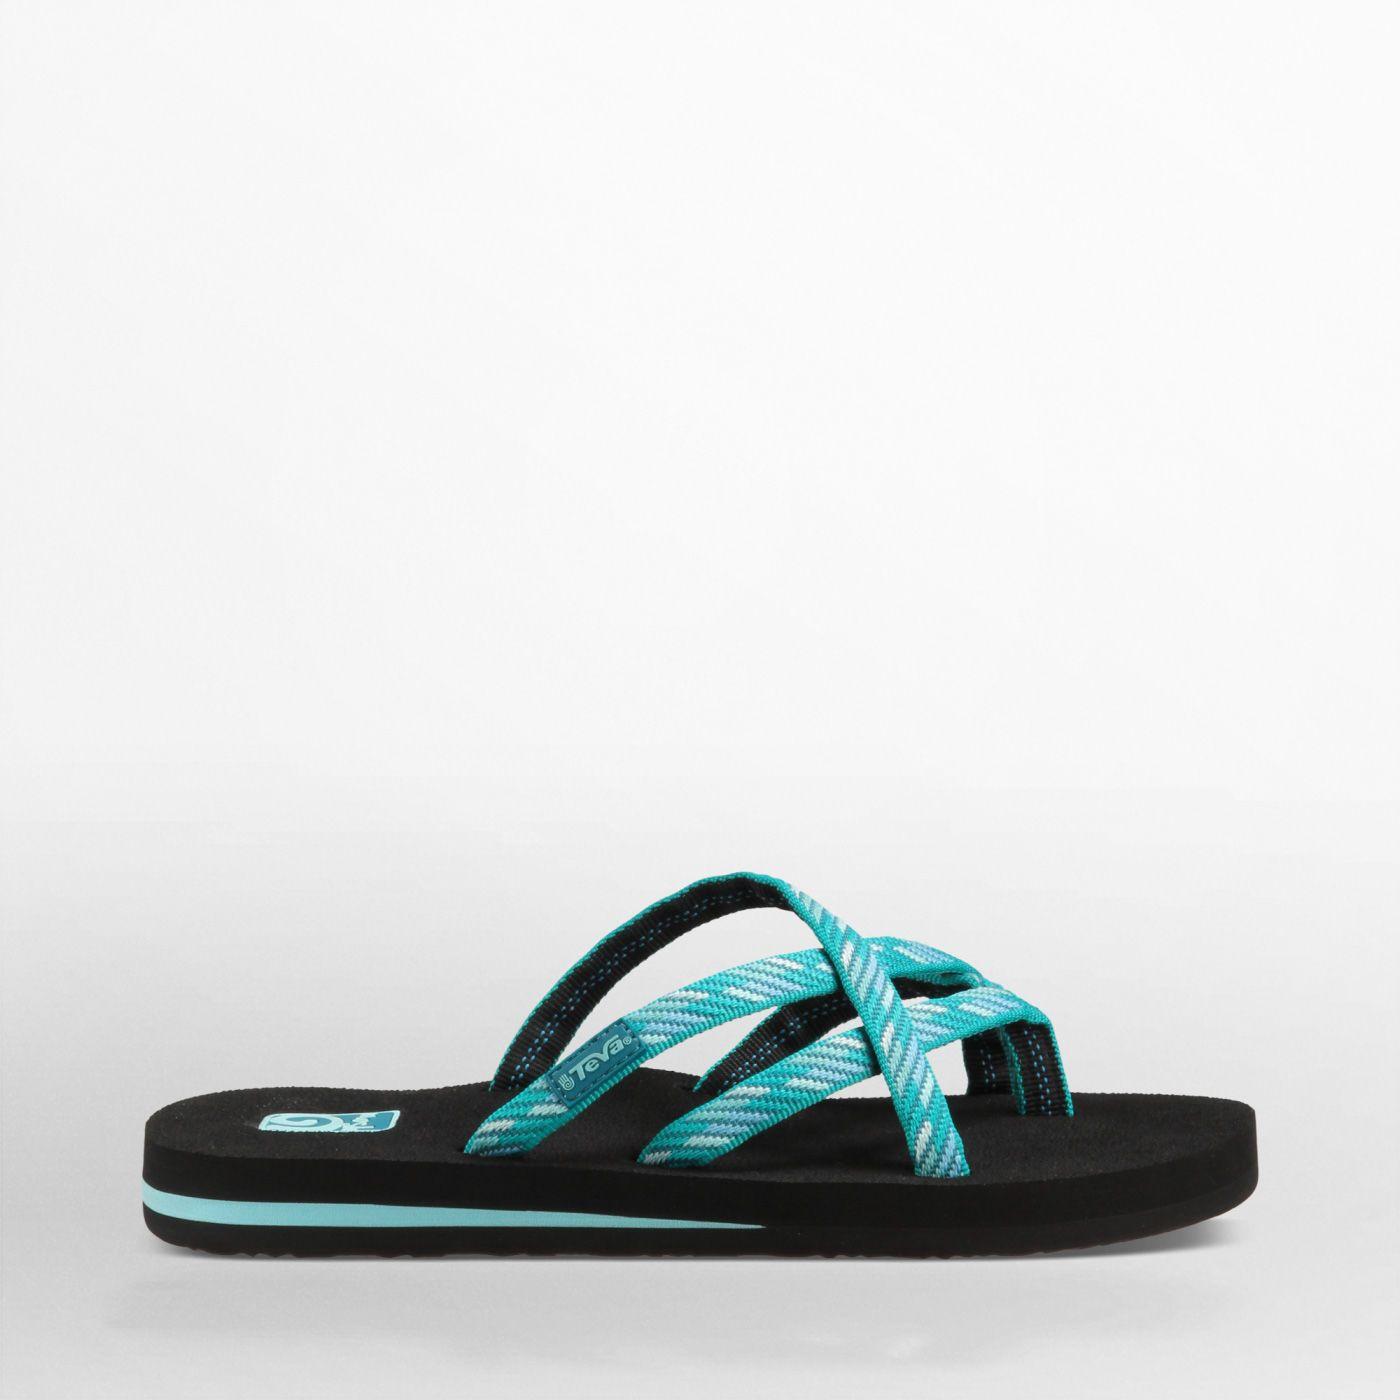 550f70d26e59 Teva® Women s Olowahu Sandal